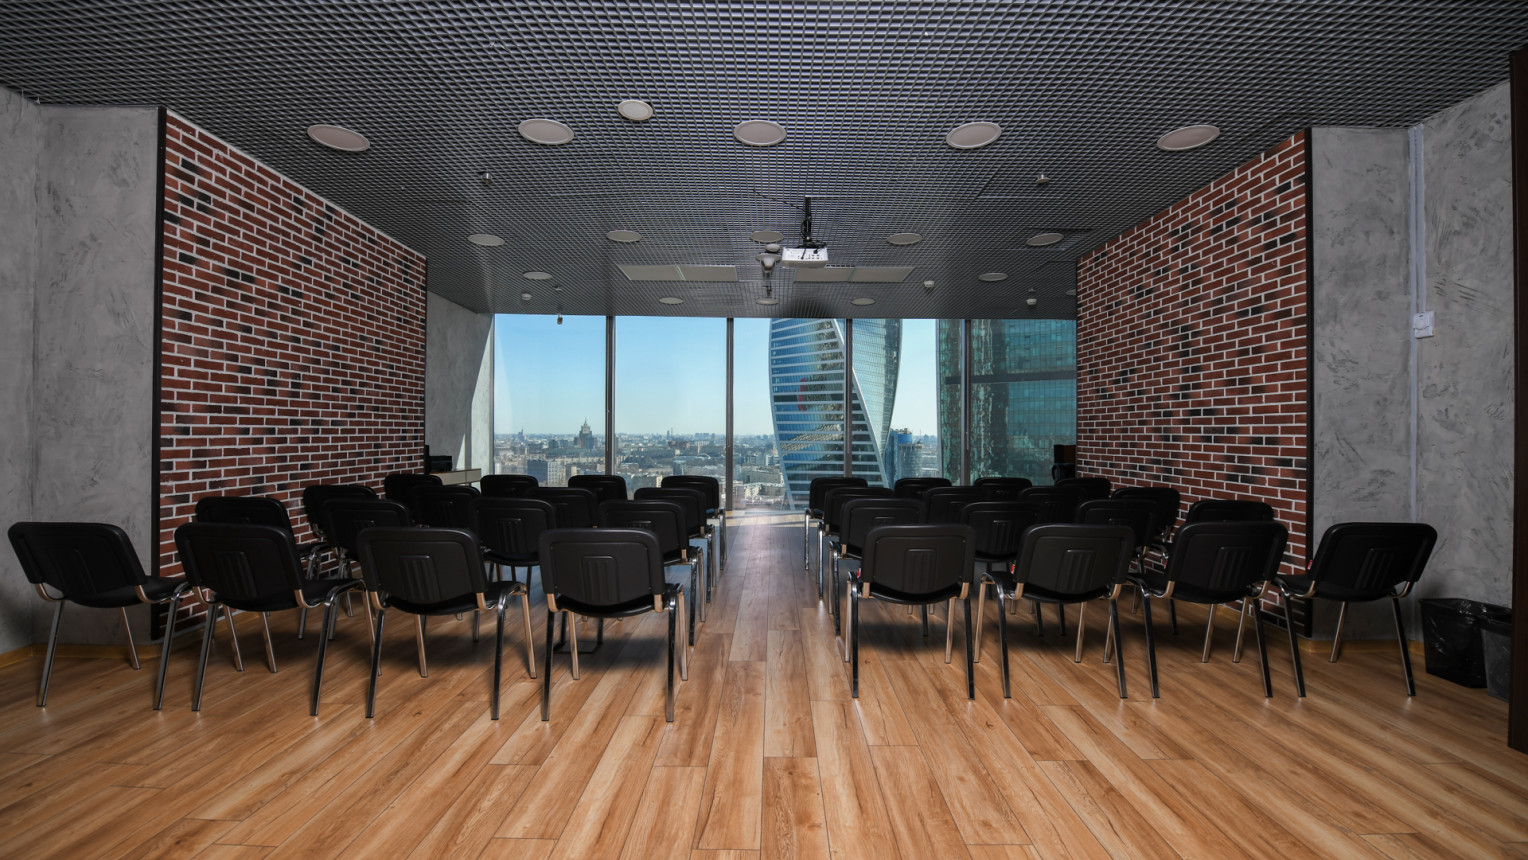 Конференц-зал Восток Центр  29 этаж